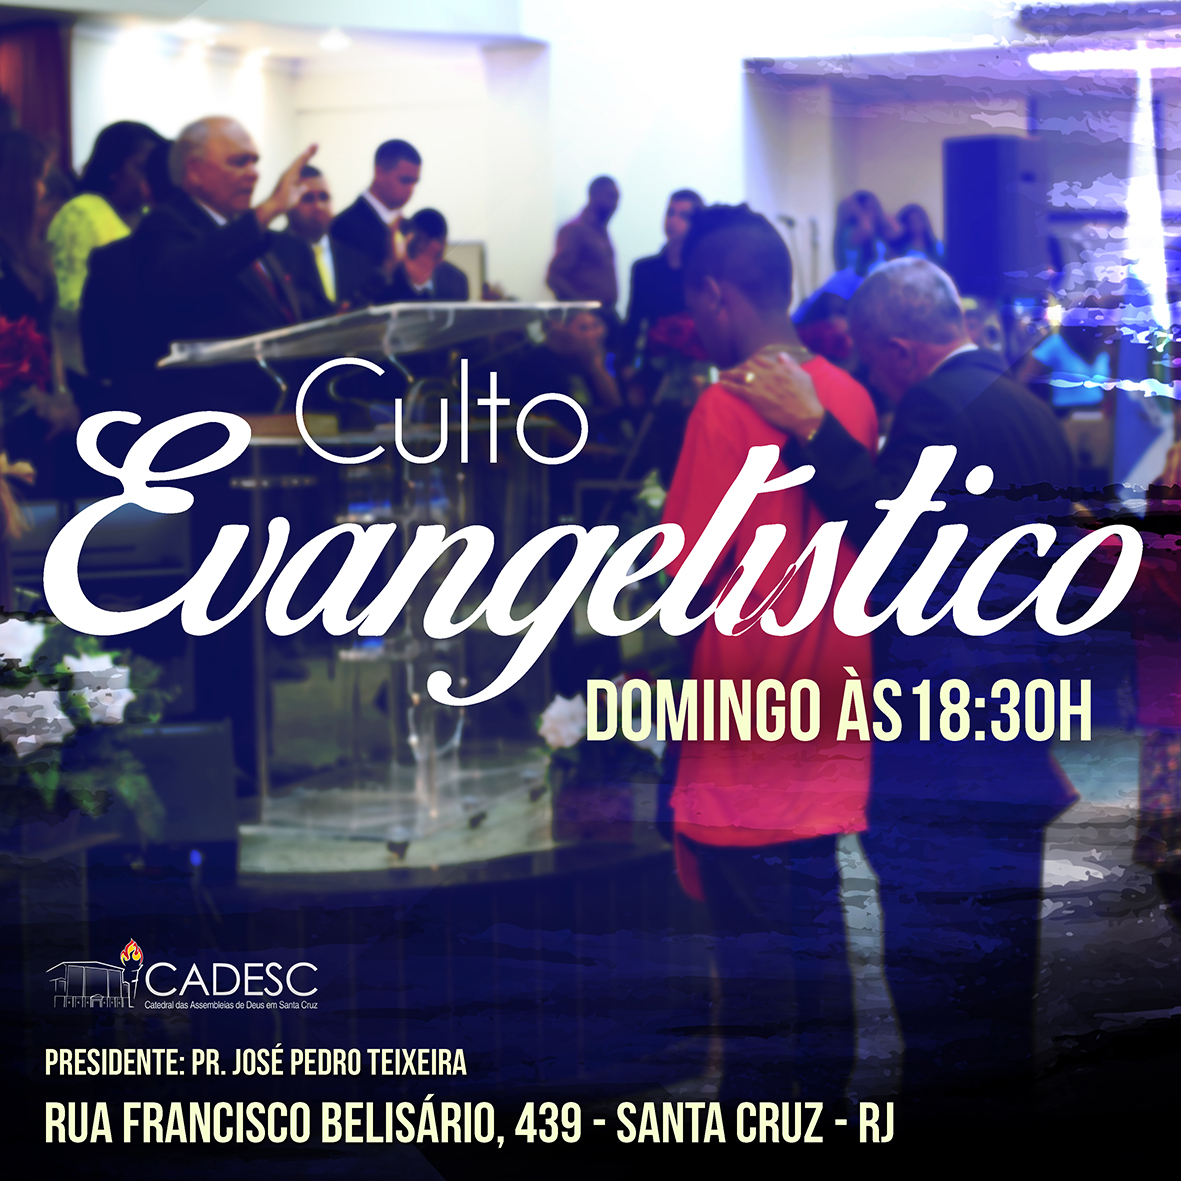 Culto Evangelistico-instagram